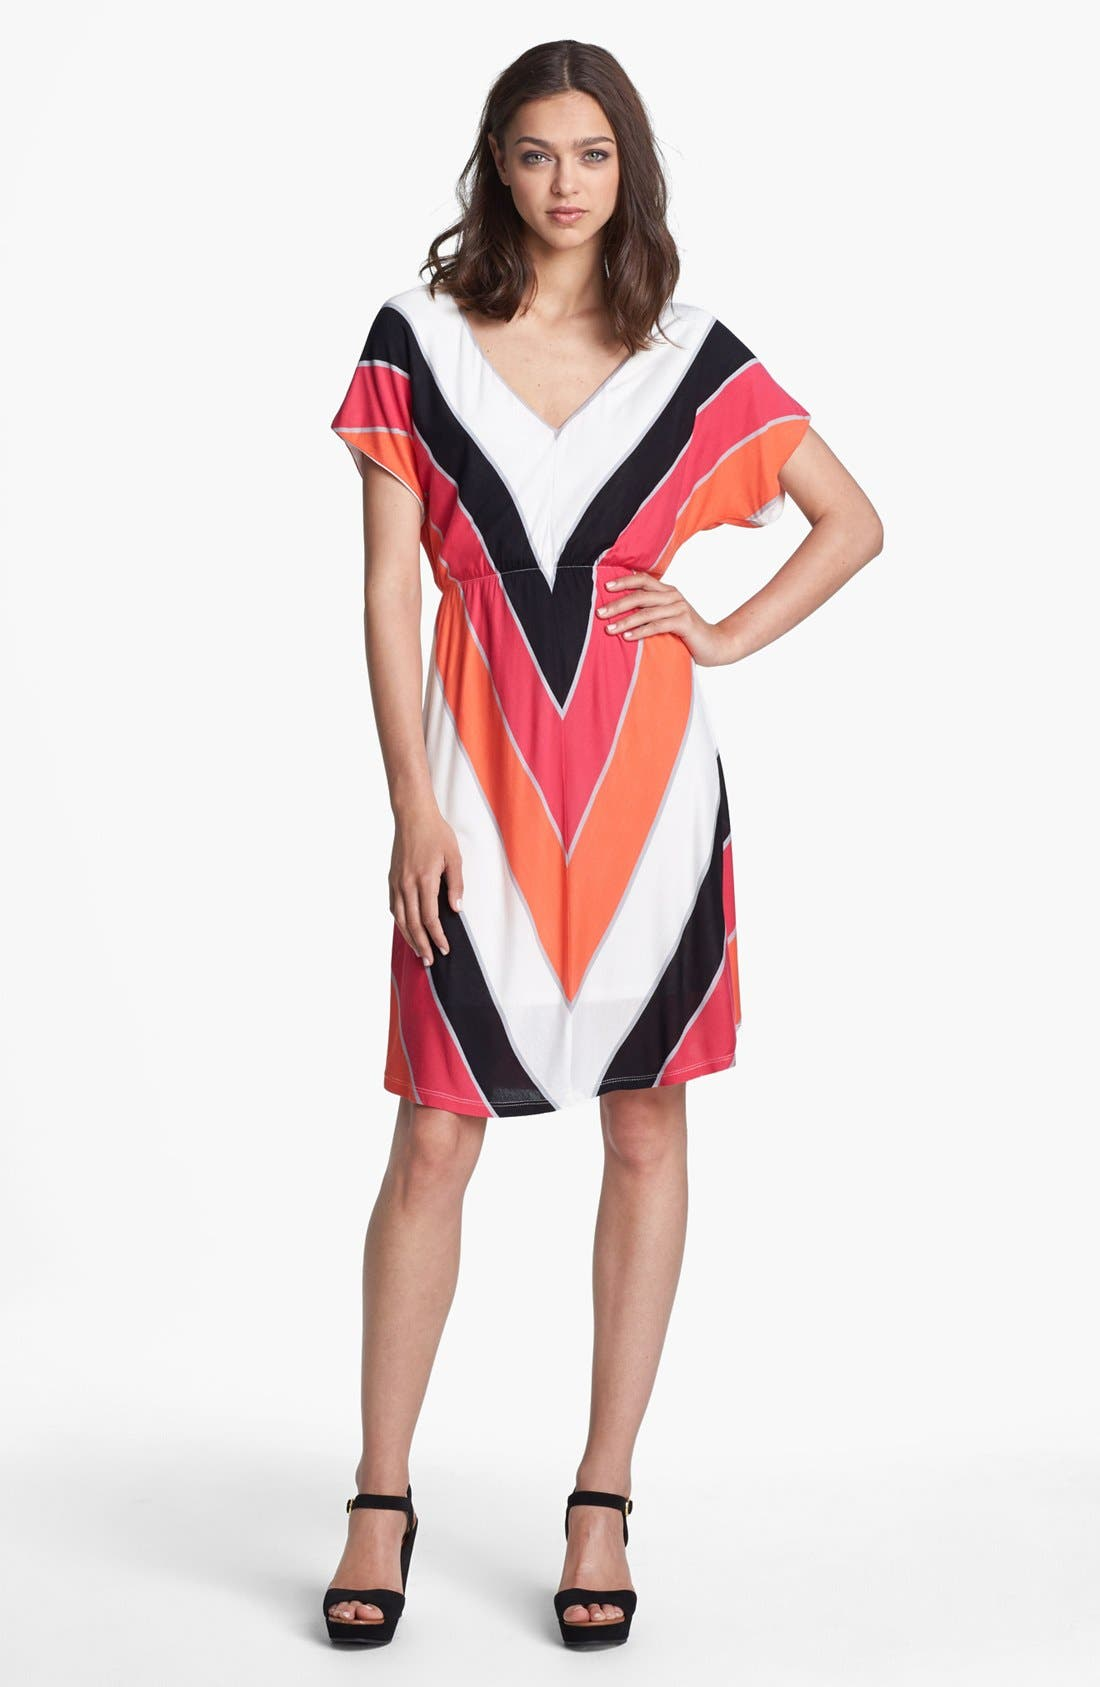 Alternate Image 1 Selected - Felicity & Coco V-Neck Chevron Stripe Jersey Dress (Nordstrom Exclusive)